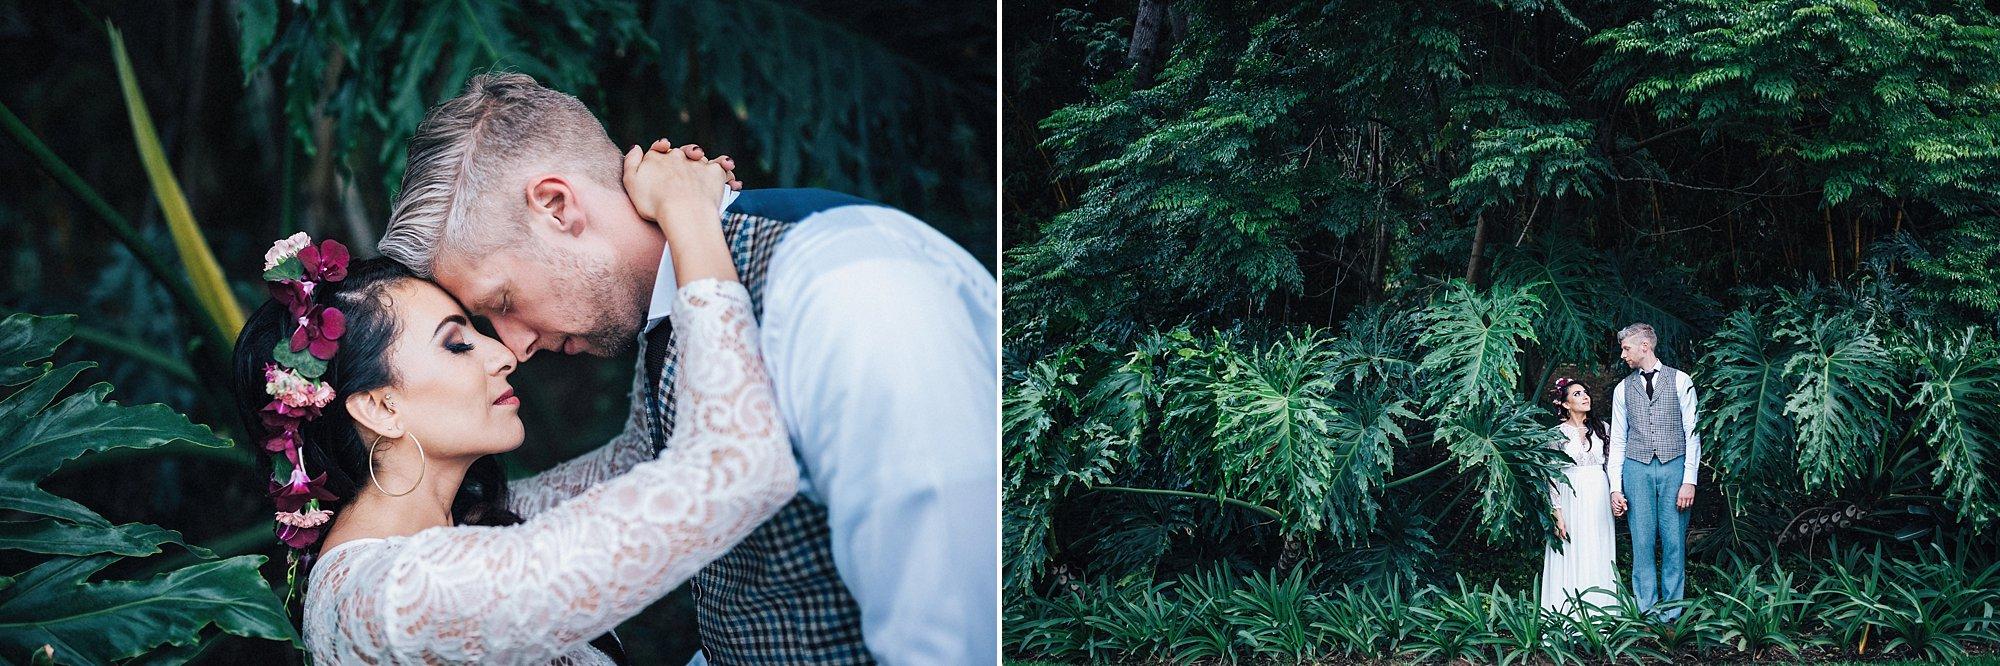 alex-yazmin-wedding-photographer-antigua-guatemala-120